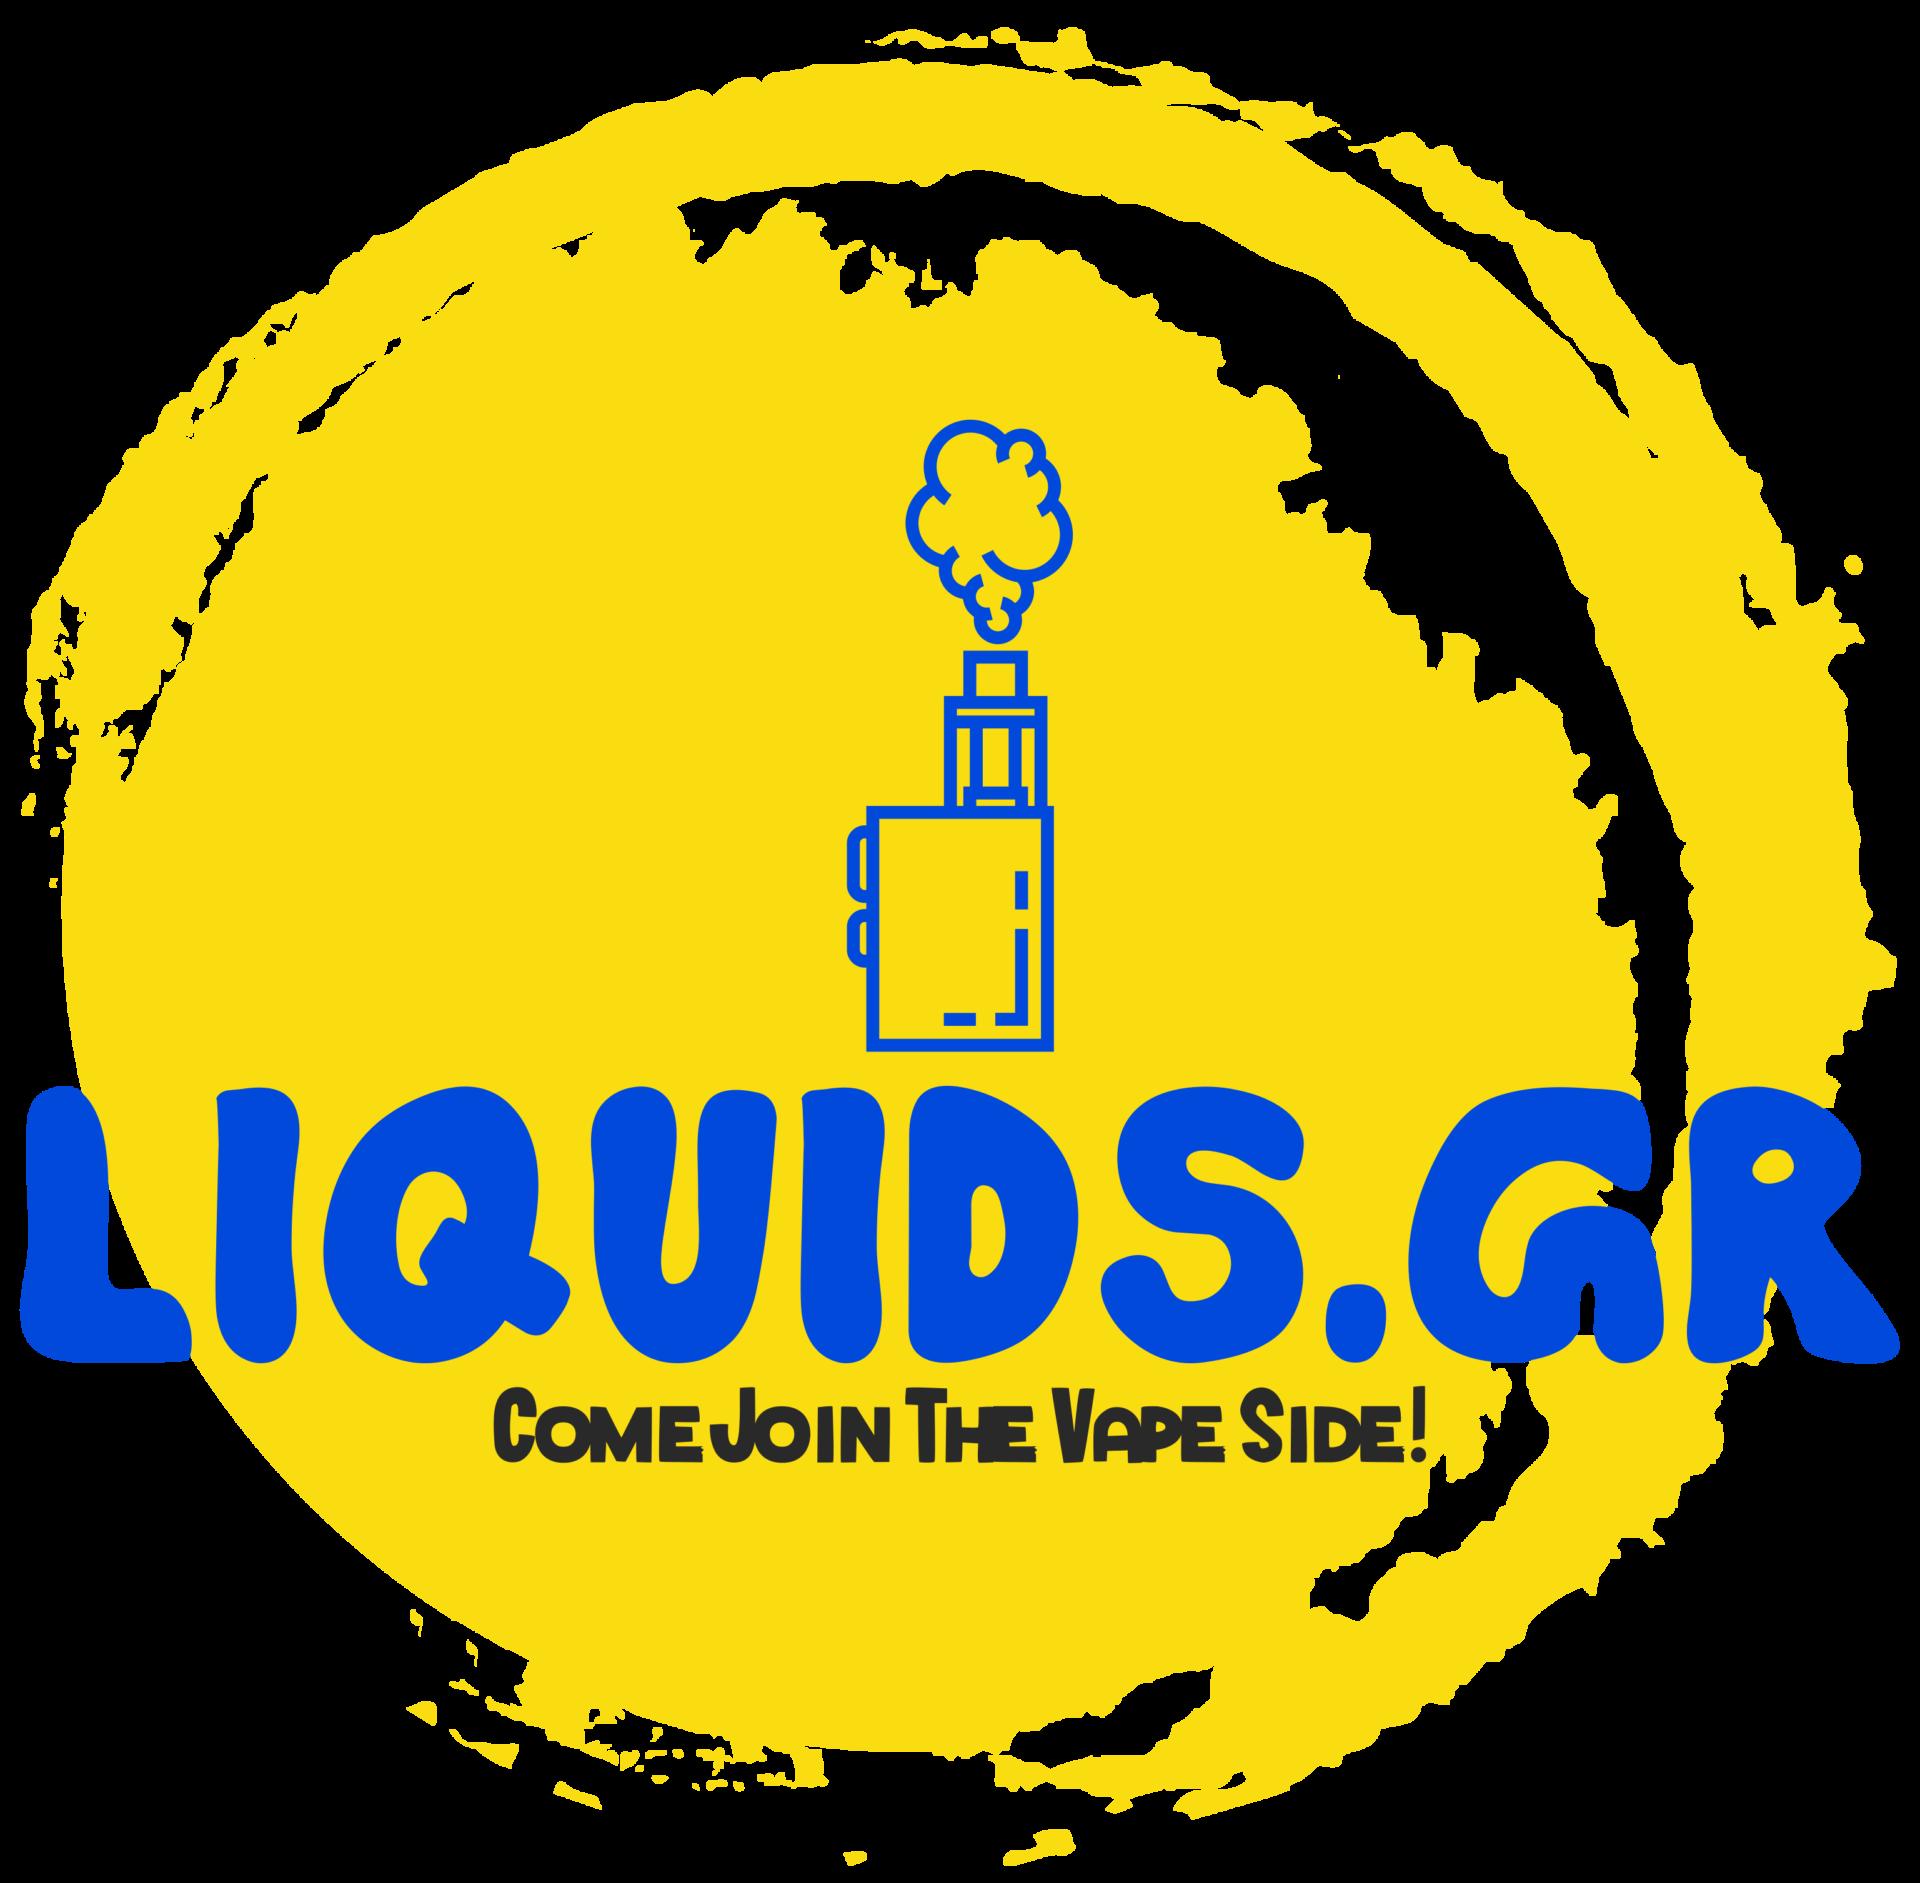 Liquids.gr